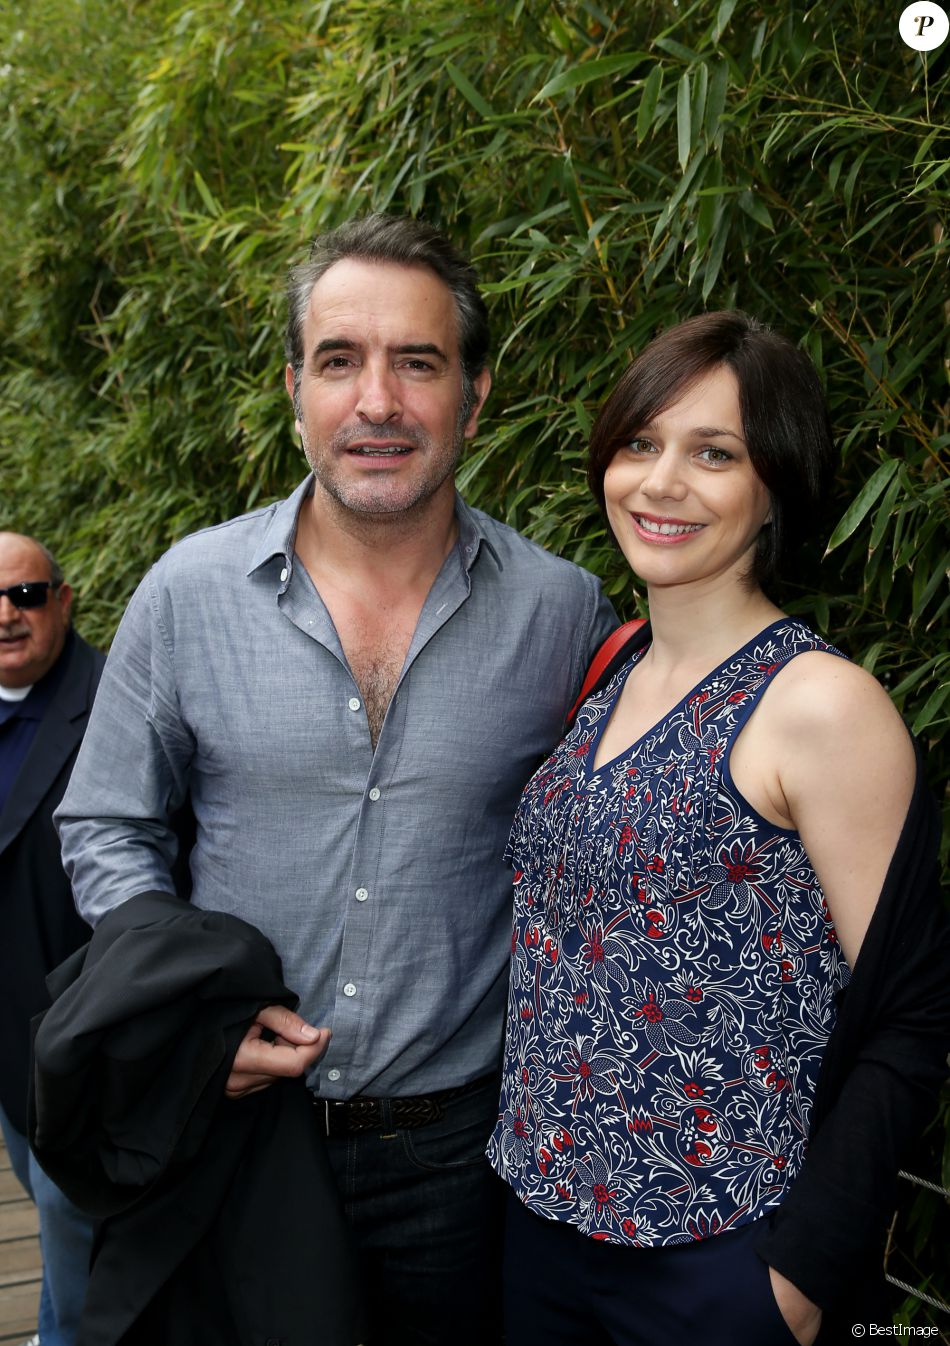 Jean dujardin et sa compagne nathalie p chalat au village for Famille dujardin